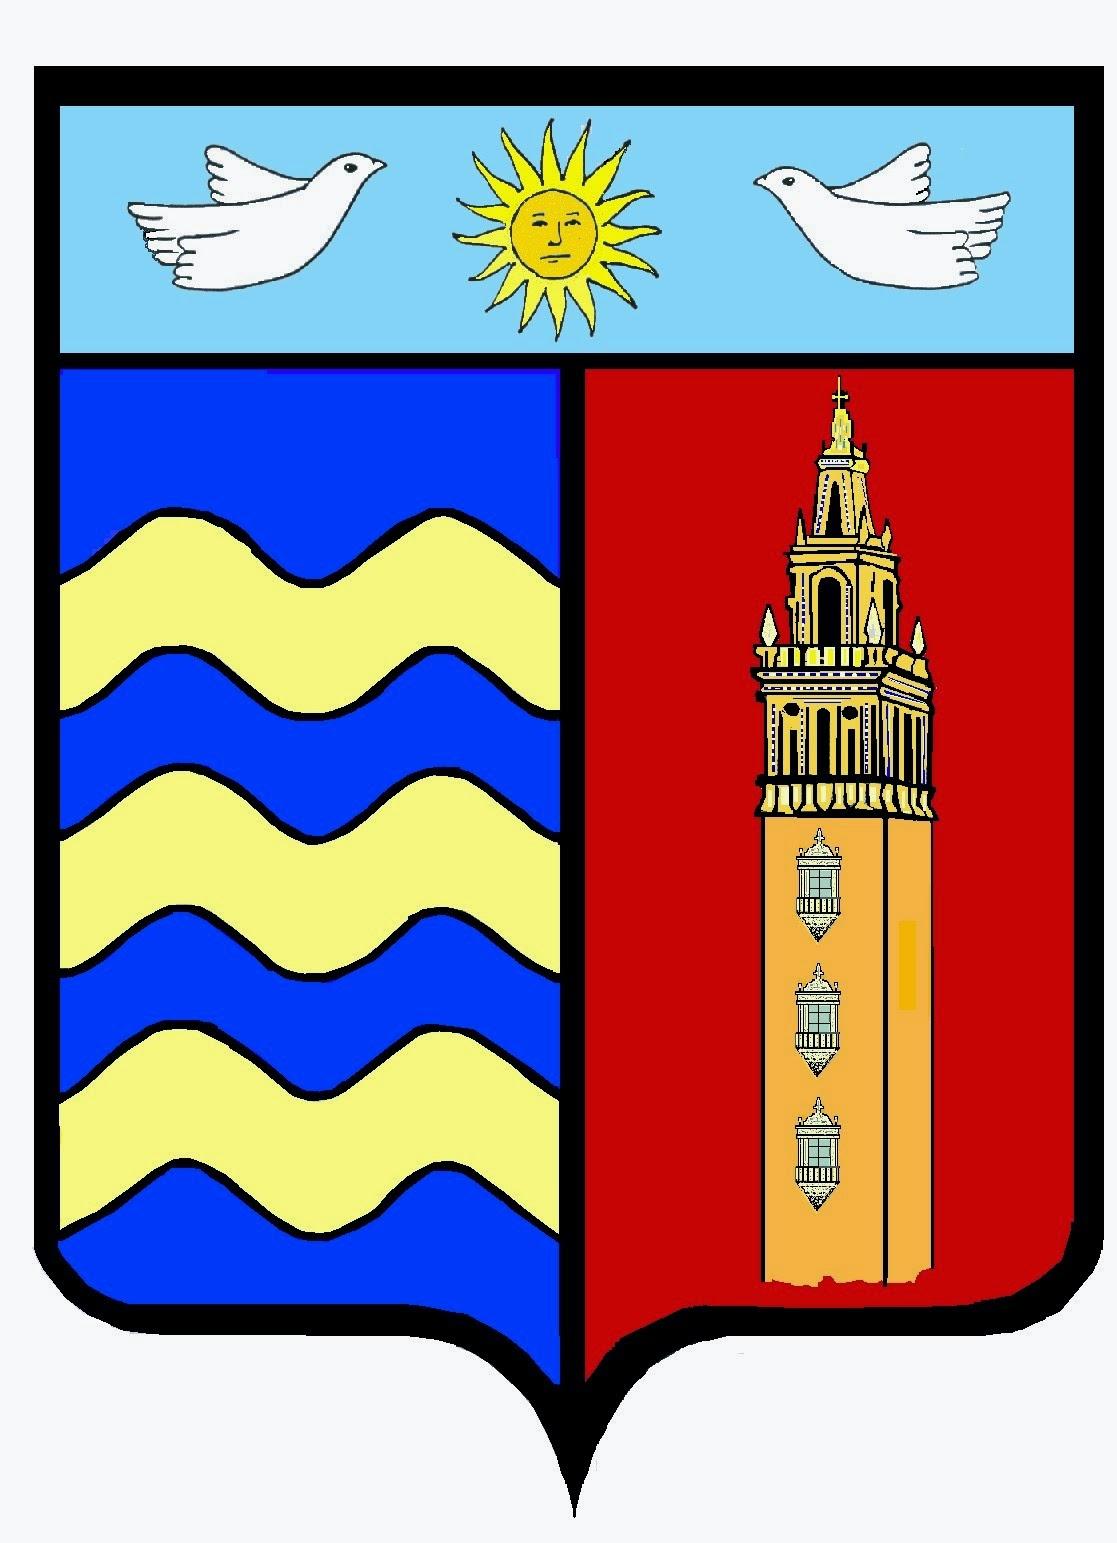 http://cpsantamariaecija.blogspot.com.es/